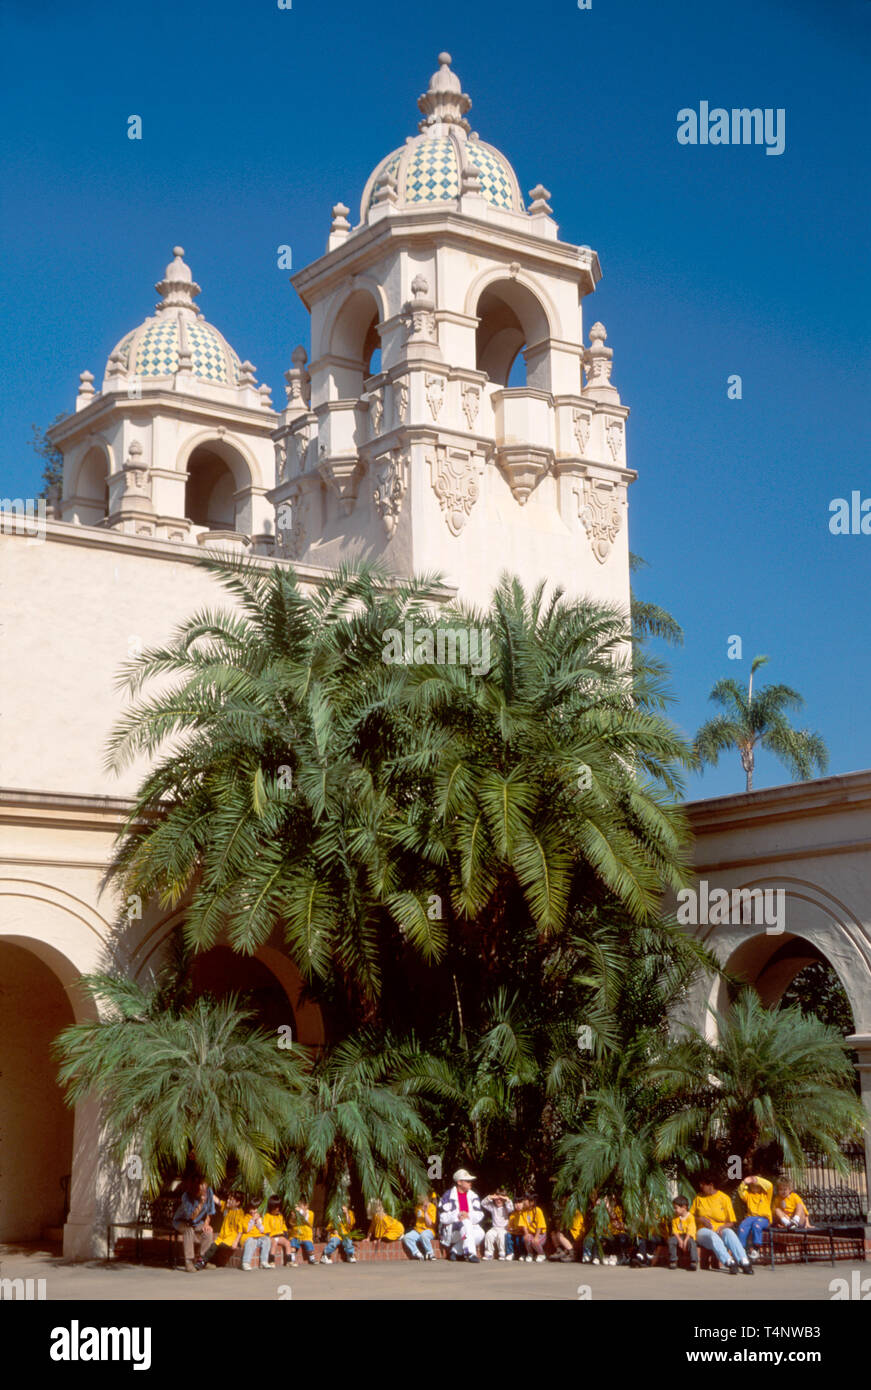 California San Diego Balboa Park, construido para la exposición Casa del Prado clase de viaje Imagen De Stock